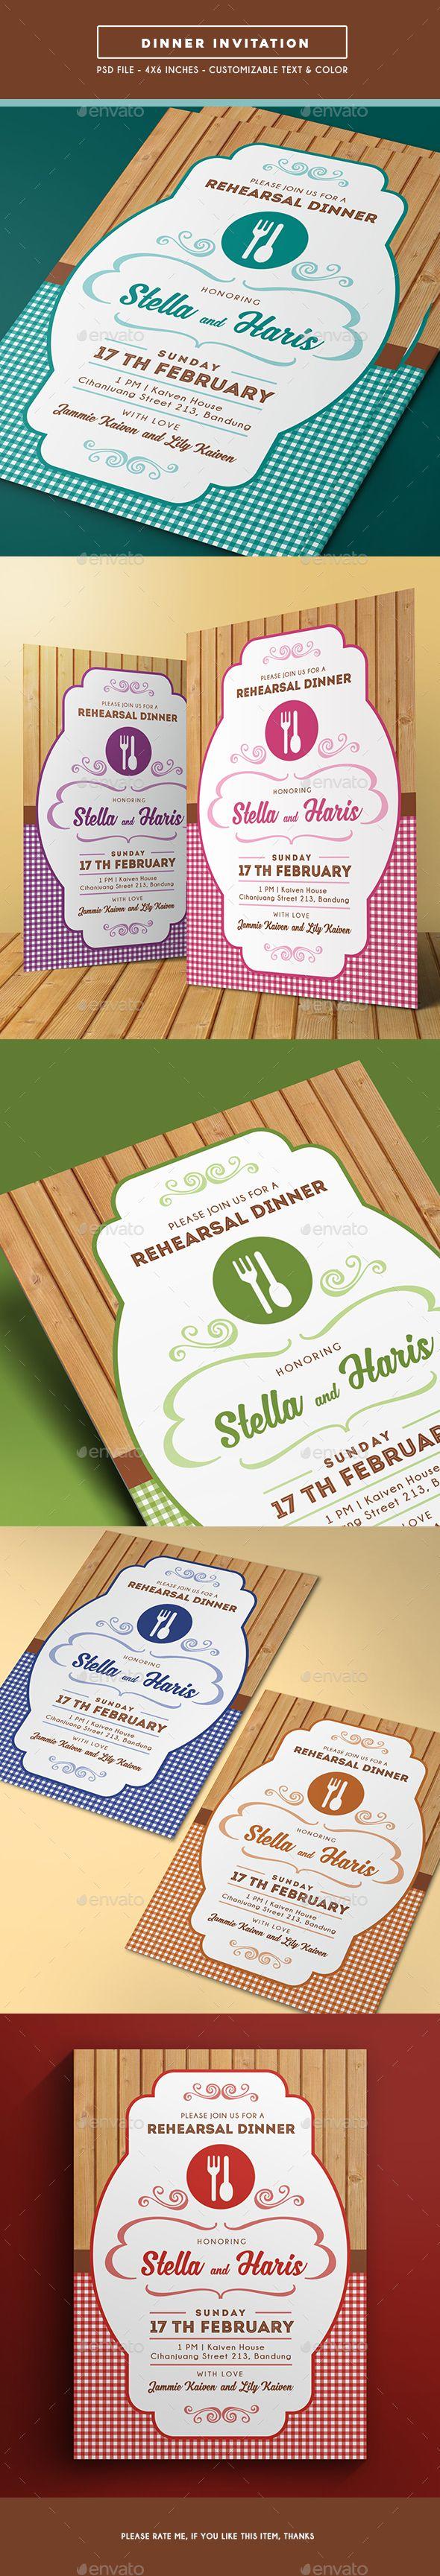 business event invitation templates%0A Dinner Invitation